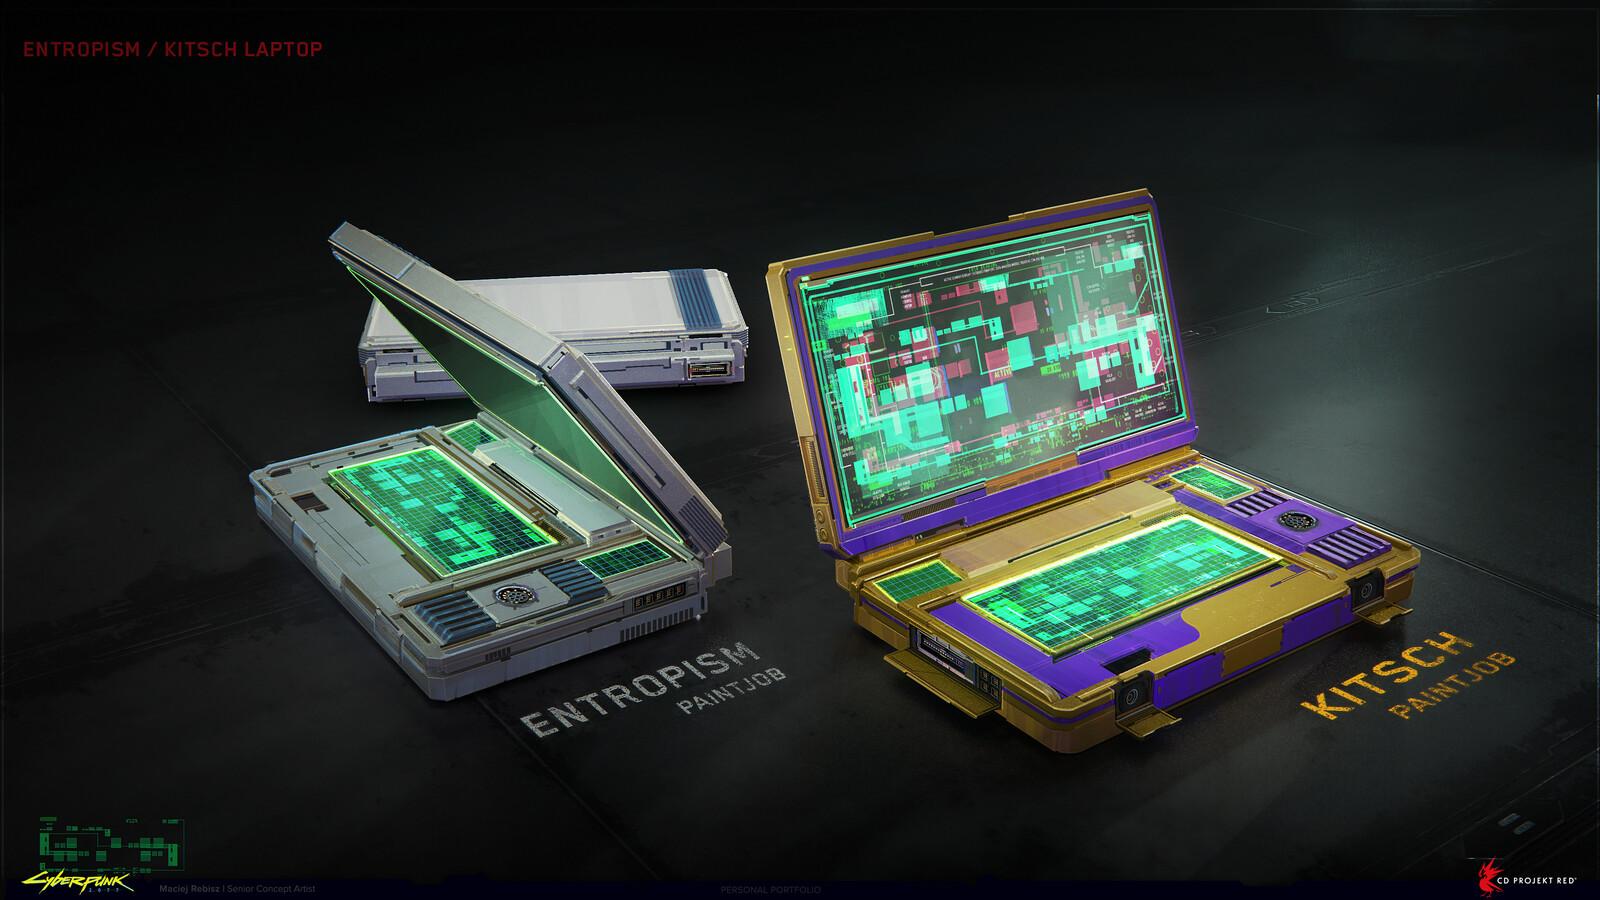 Entropism/Kitsch laptops